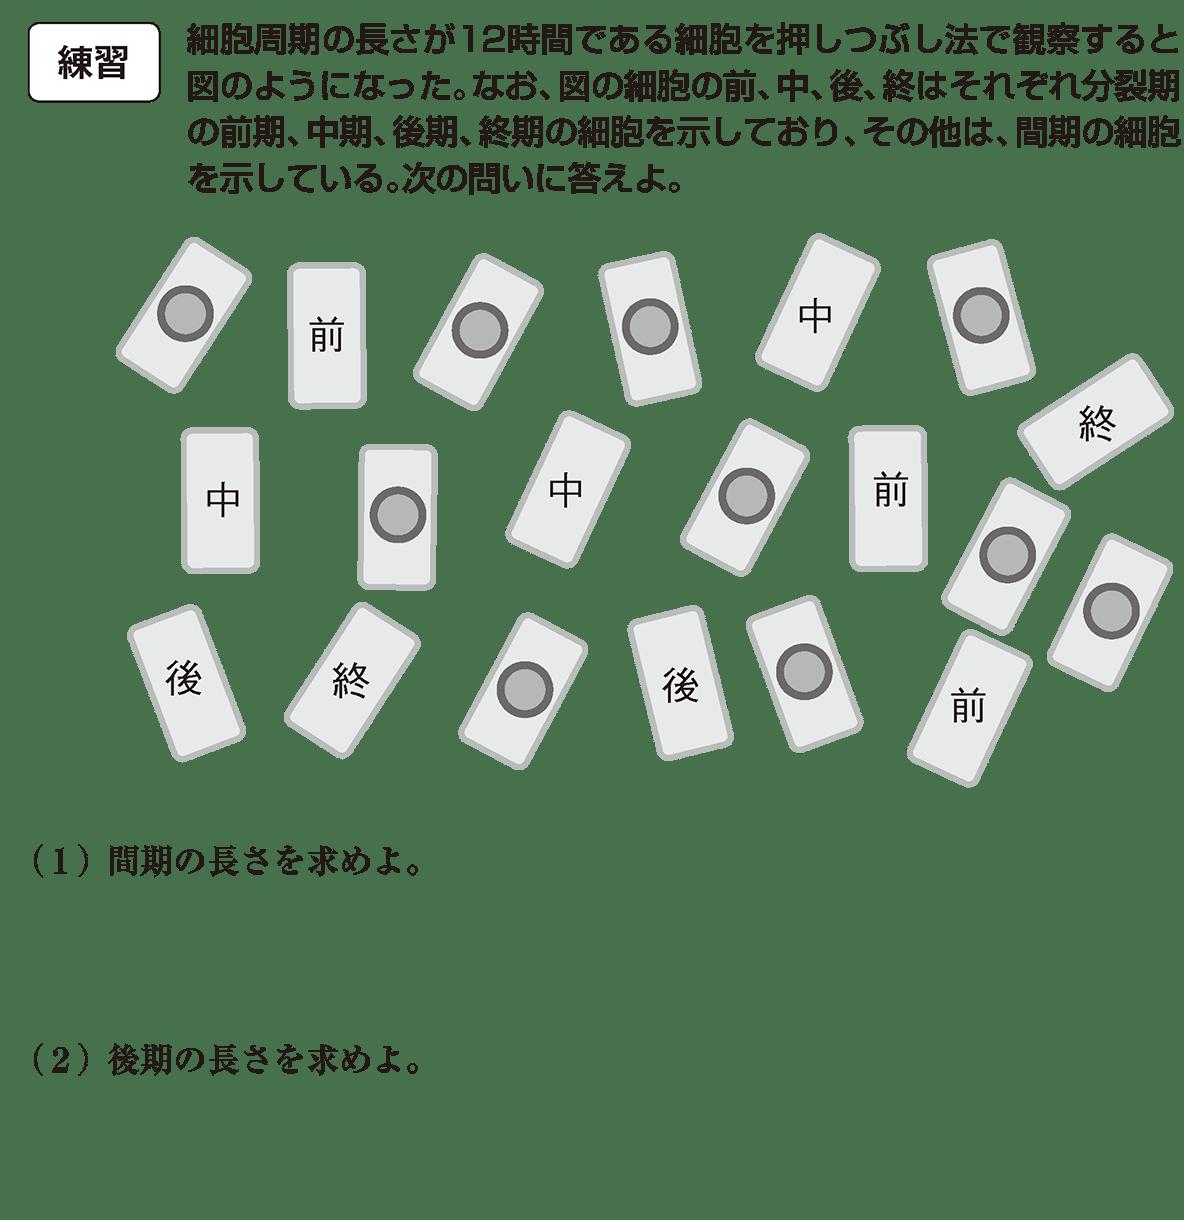 高校 生物基礎 遺伝子21 練習 カッコ空欄